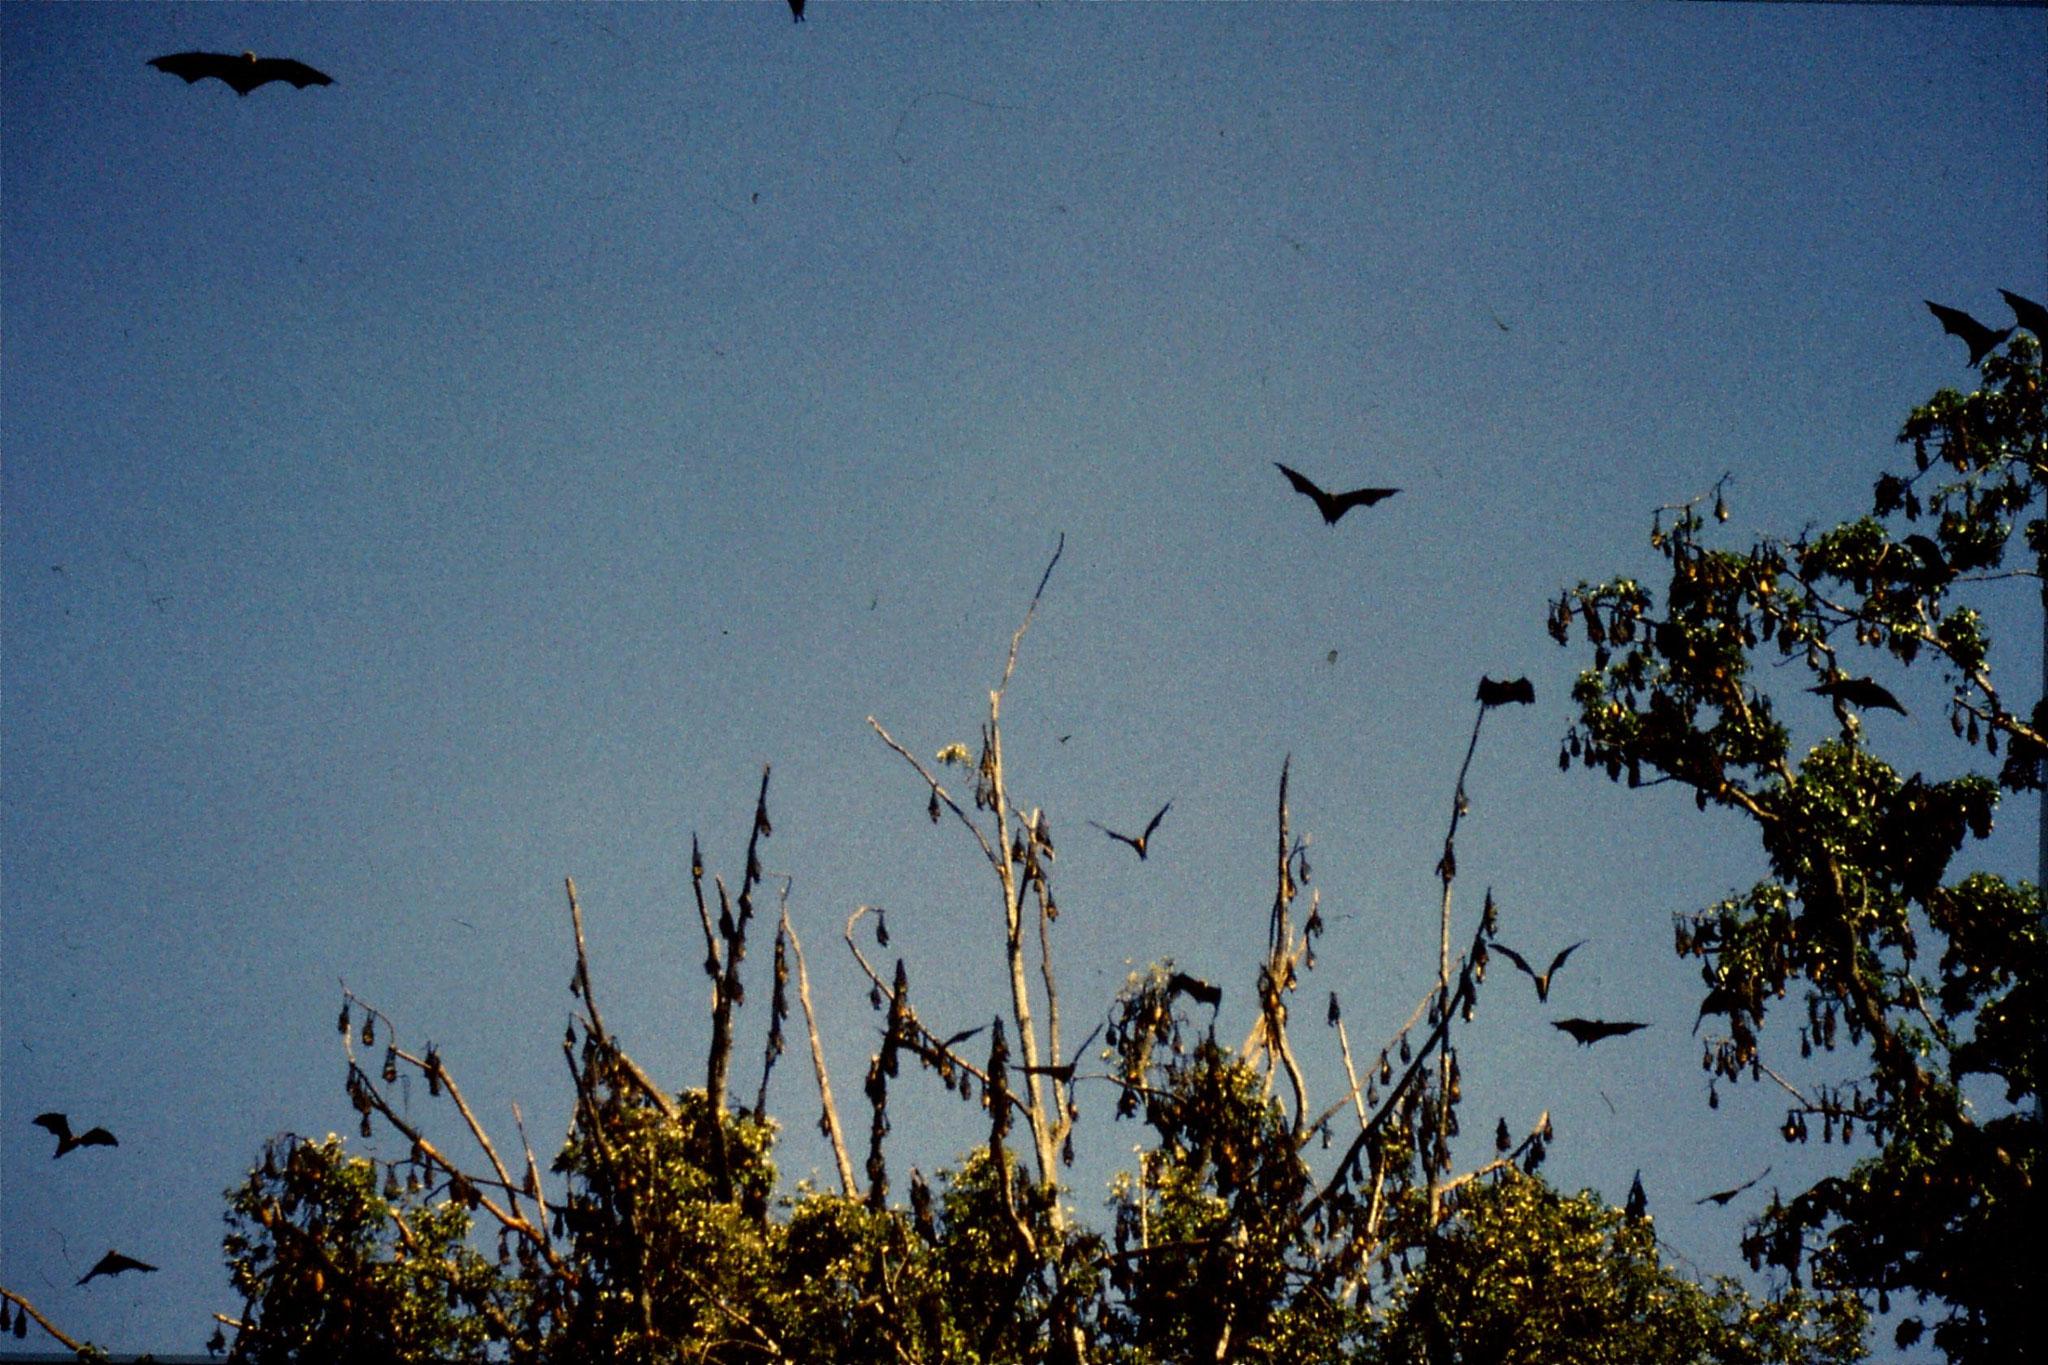 5/2/1990: 34: Kandy Botanic Gardens